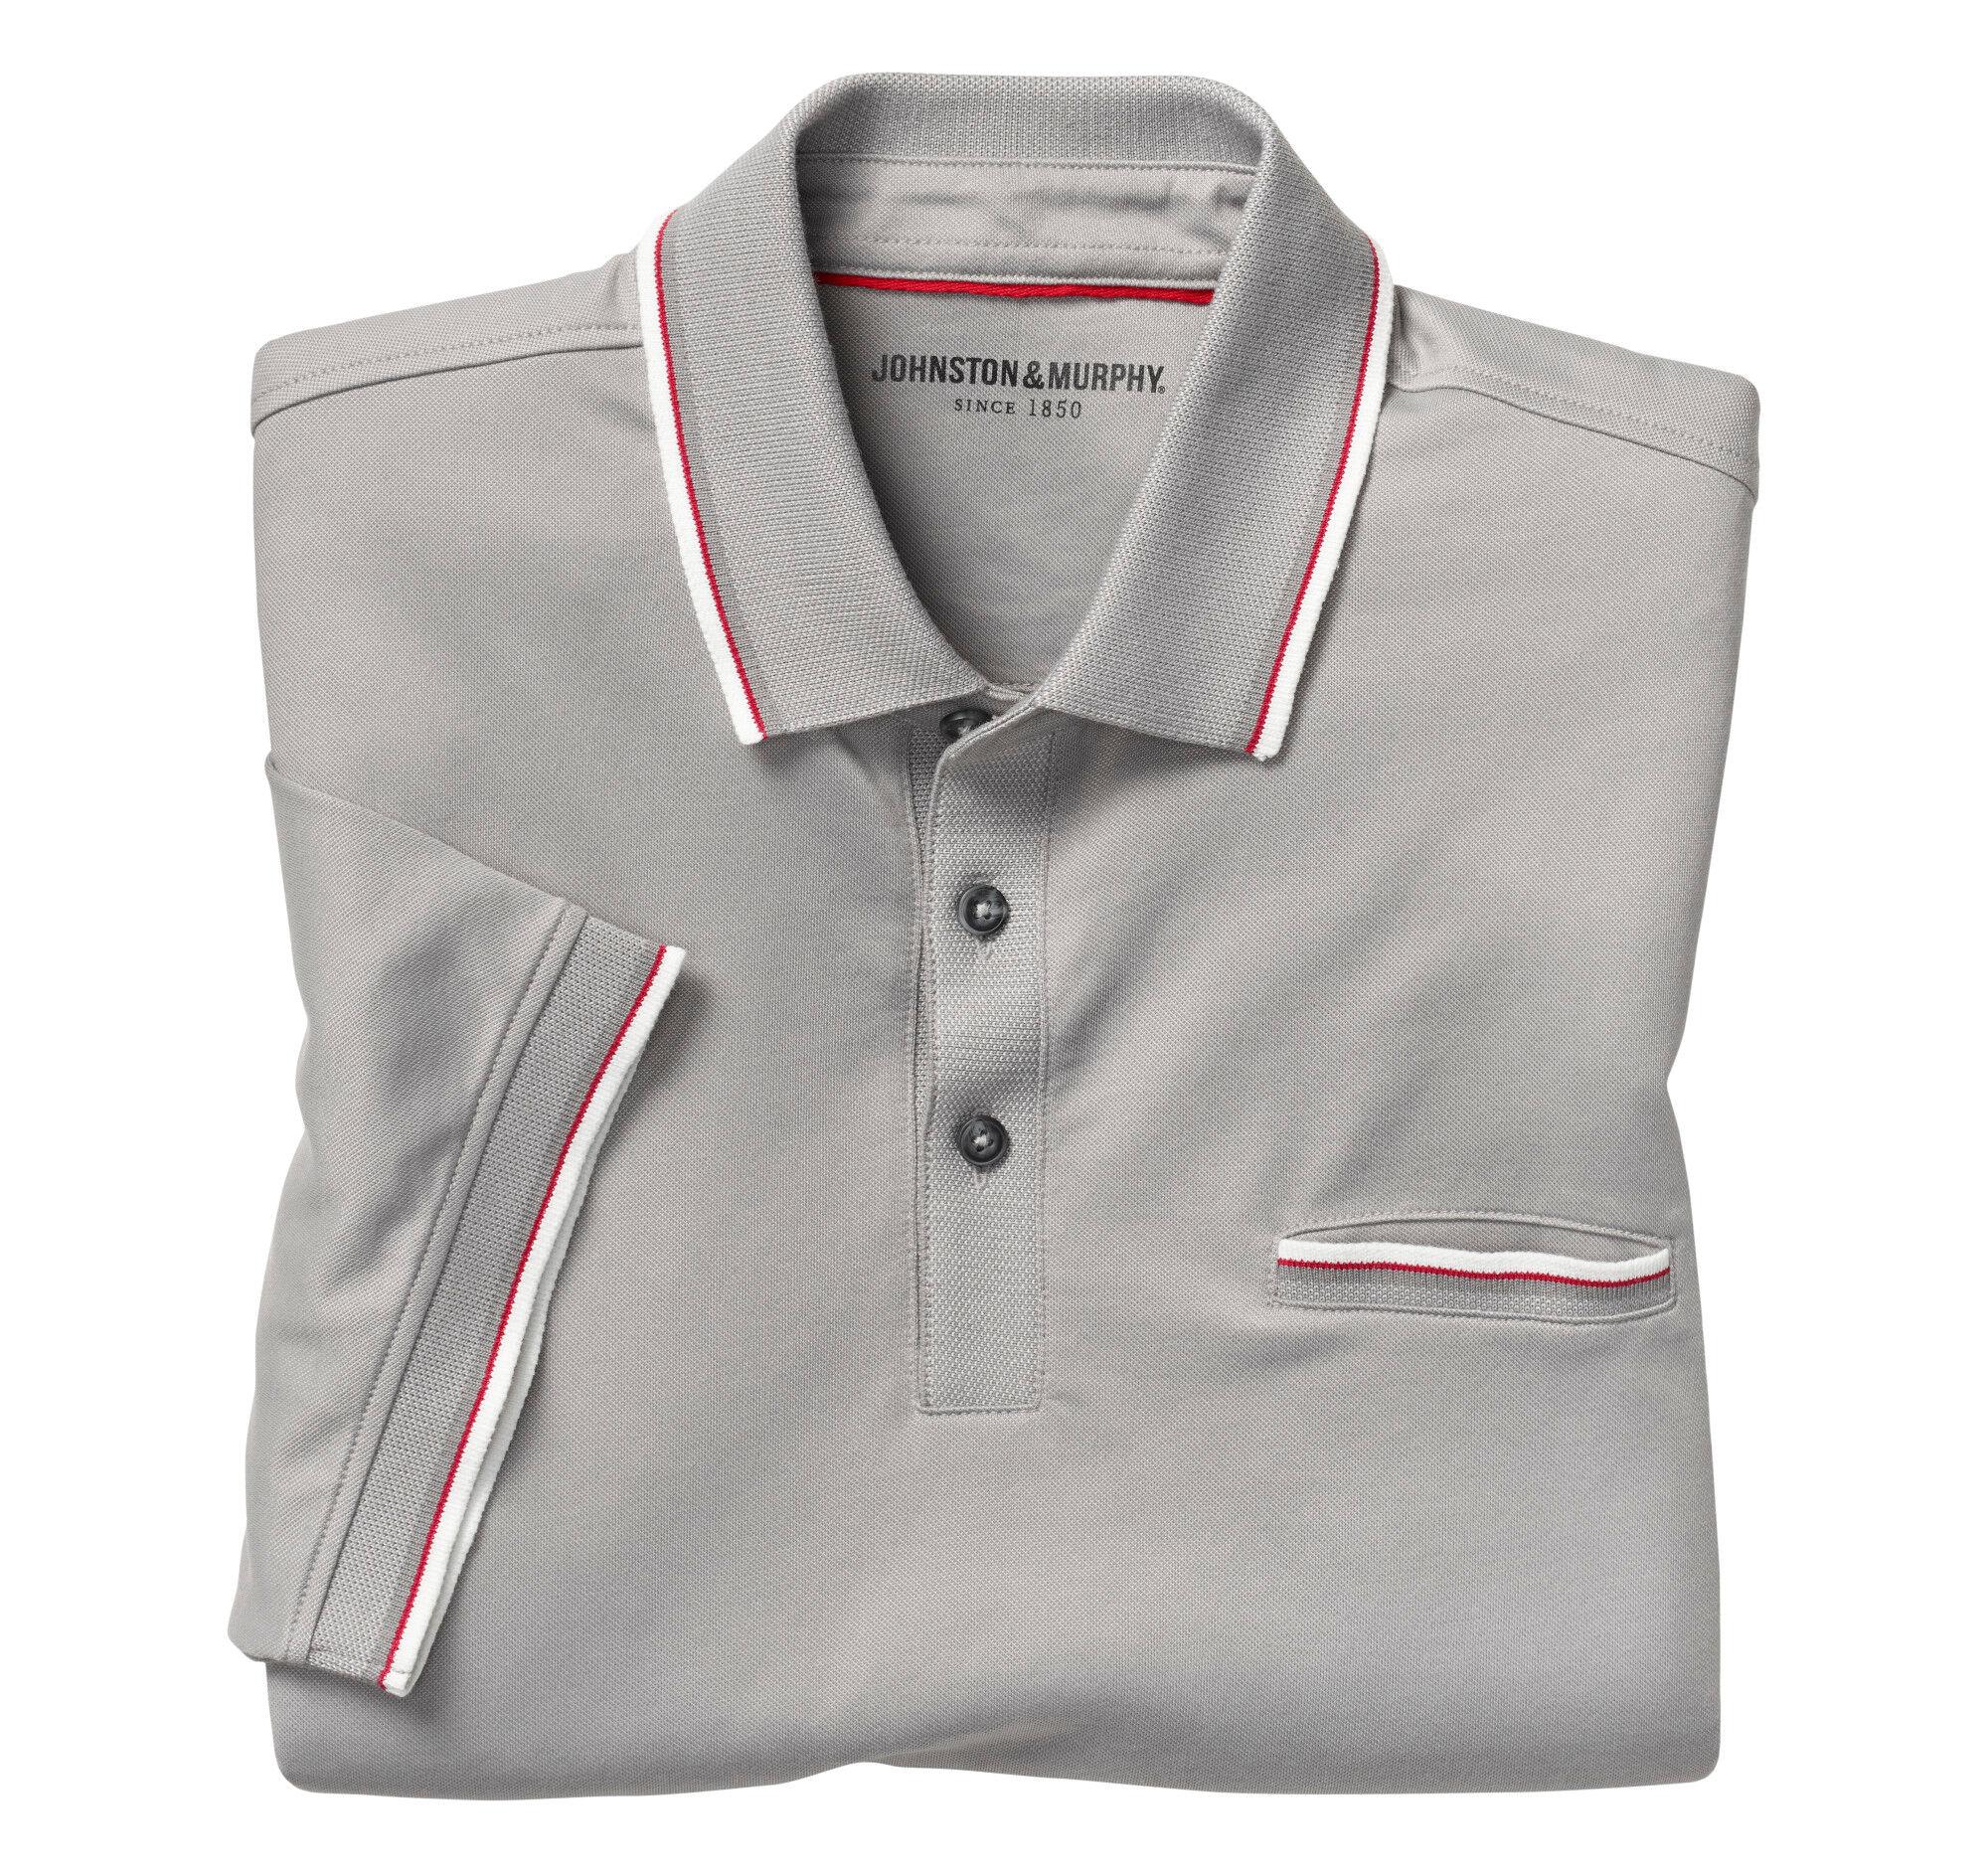 Johnston & Murphy Men's Sport Polo - Charcoal - Size L